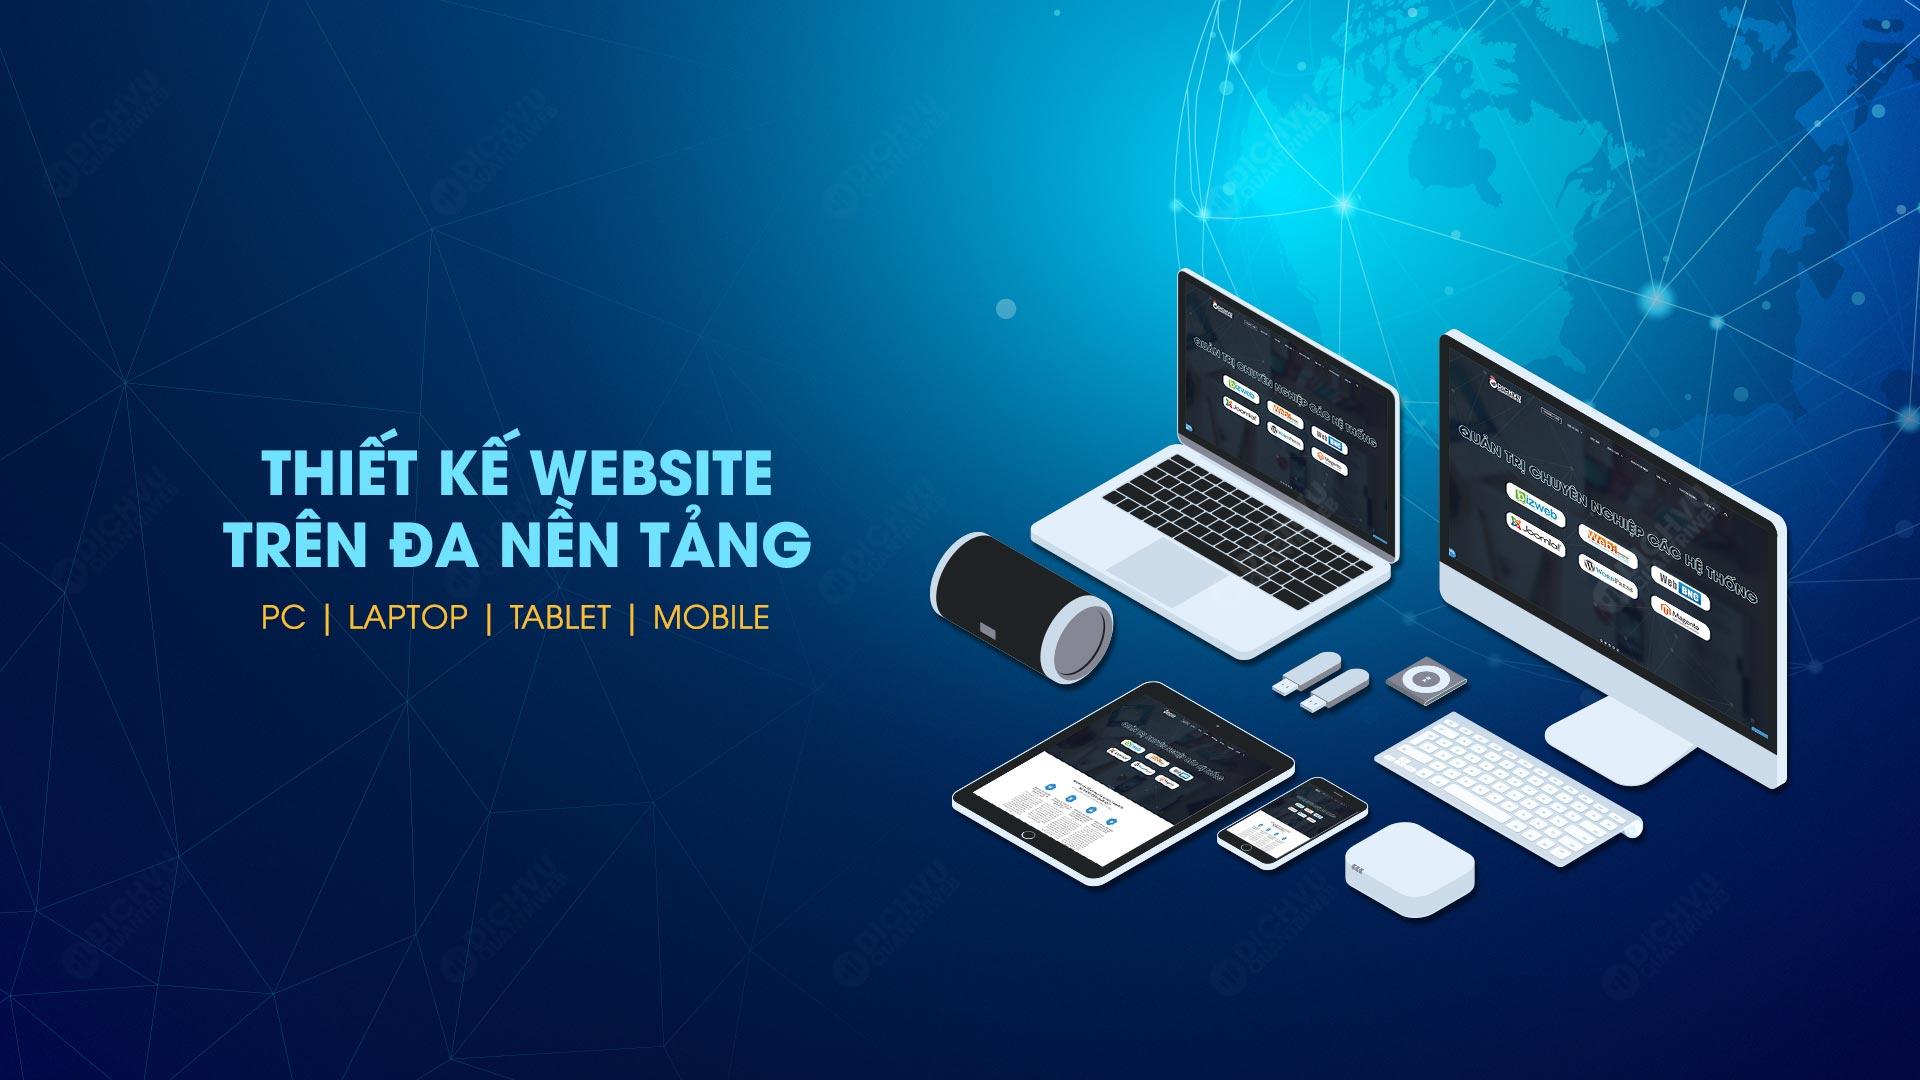 top-5-dich-vu-quan-tri-website-uy-tin-tai-viet-nam